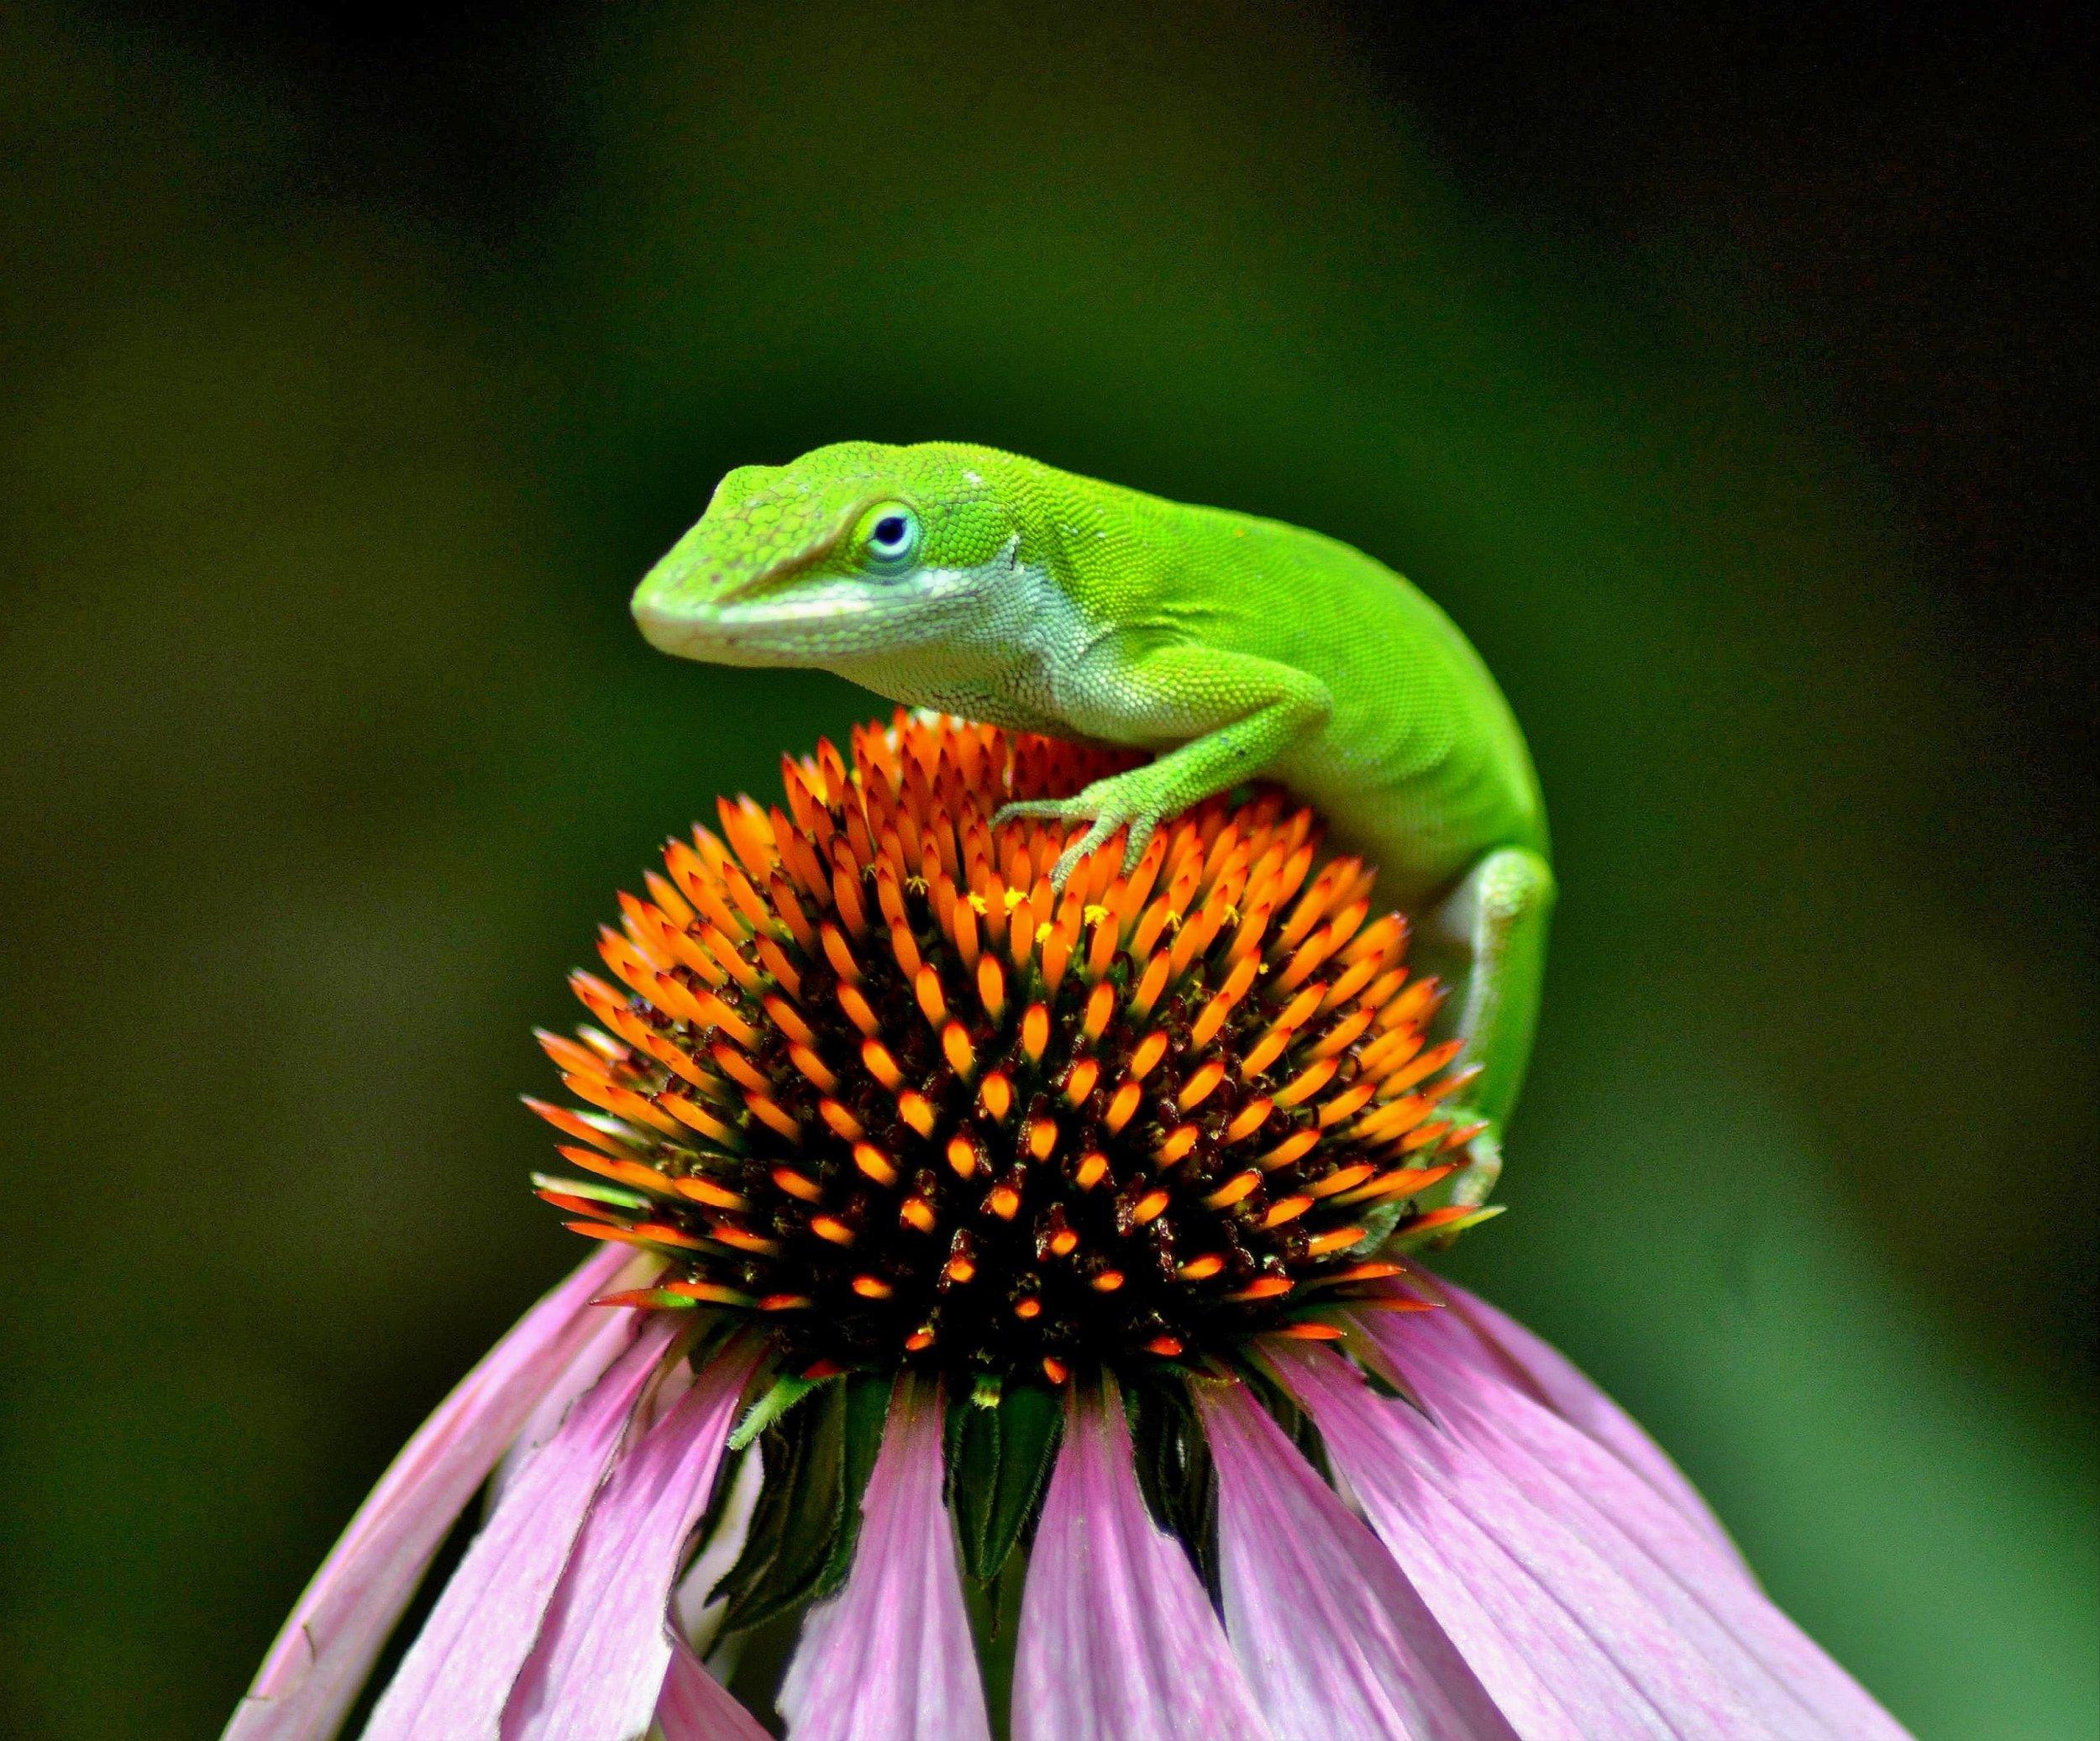 Photo by Terri Bowman  [Image Description] A lizard sitting on top of a plant.